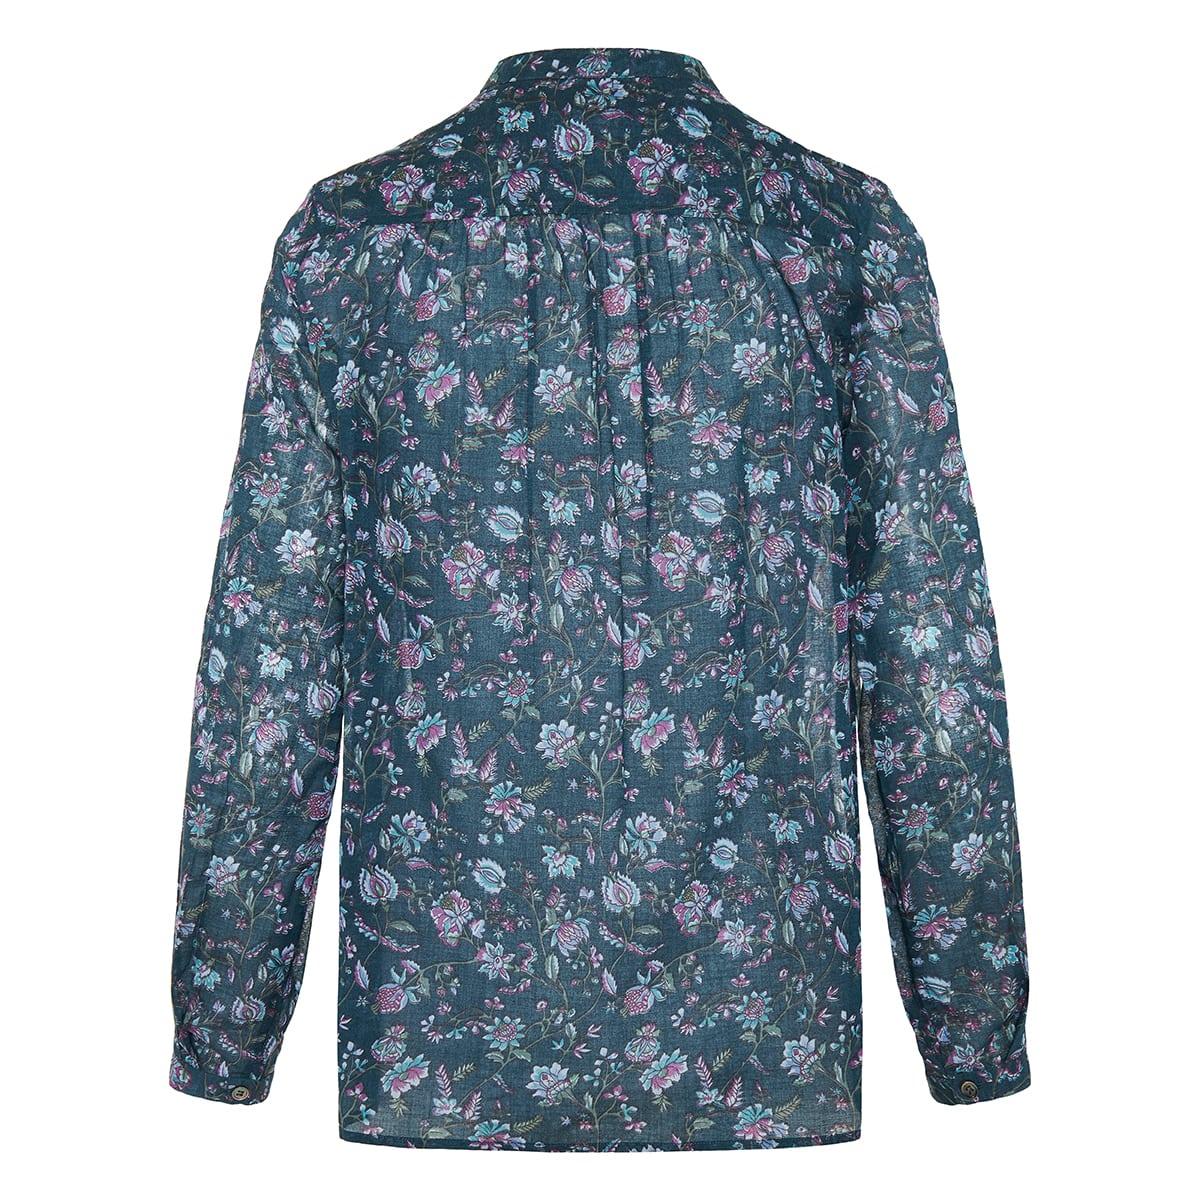 Maria floral cotton shirt